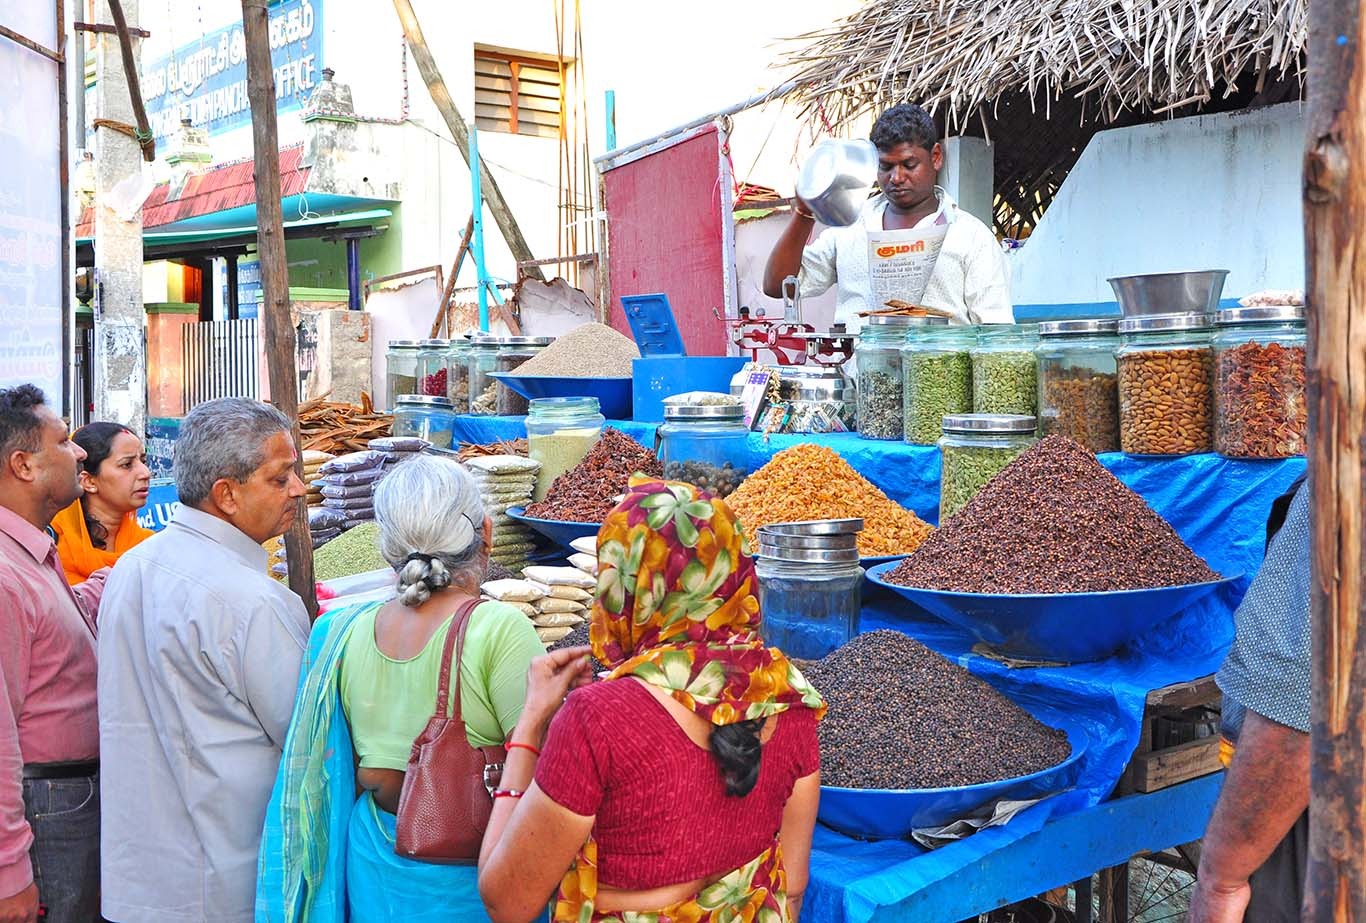 cucina-tradizionale-Rajasthan-mercato-spezie-zeppelin